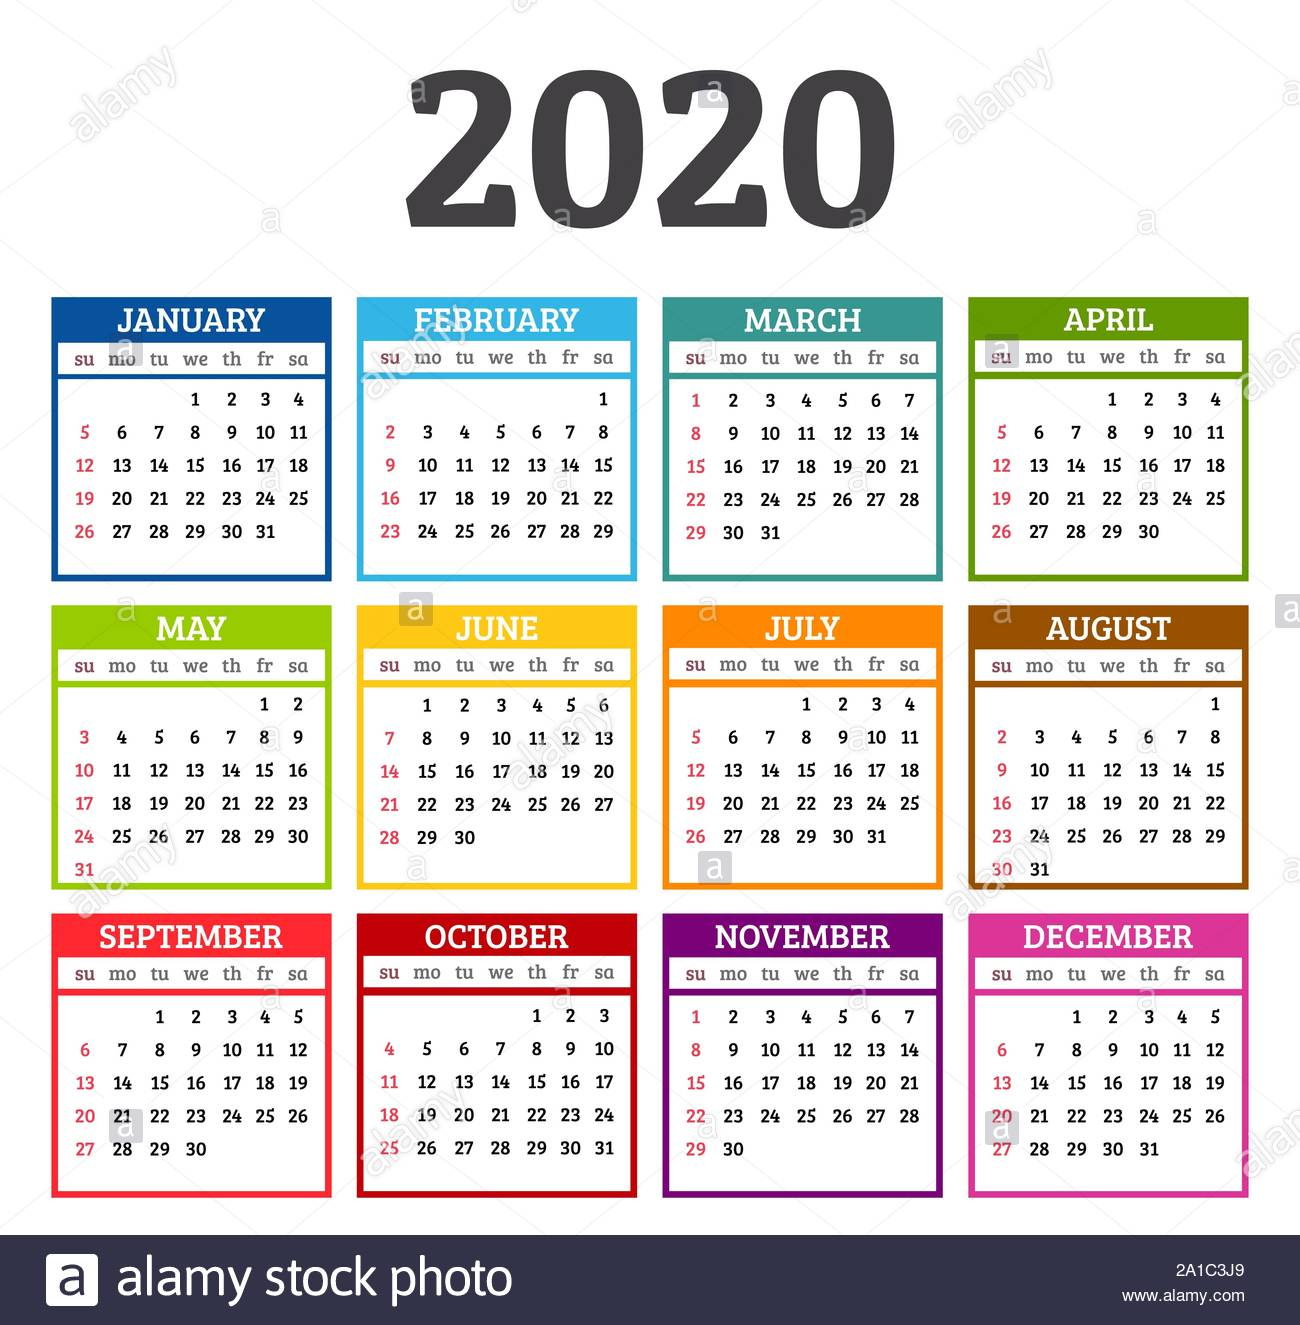 Calendar Week 24 2020 | Calendar Printables Free Templates